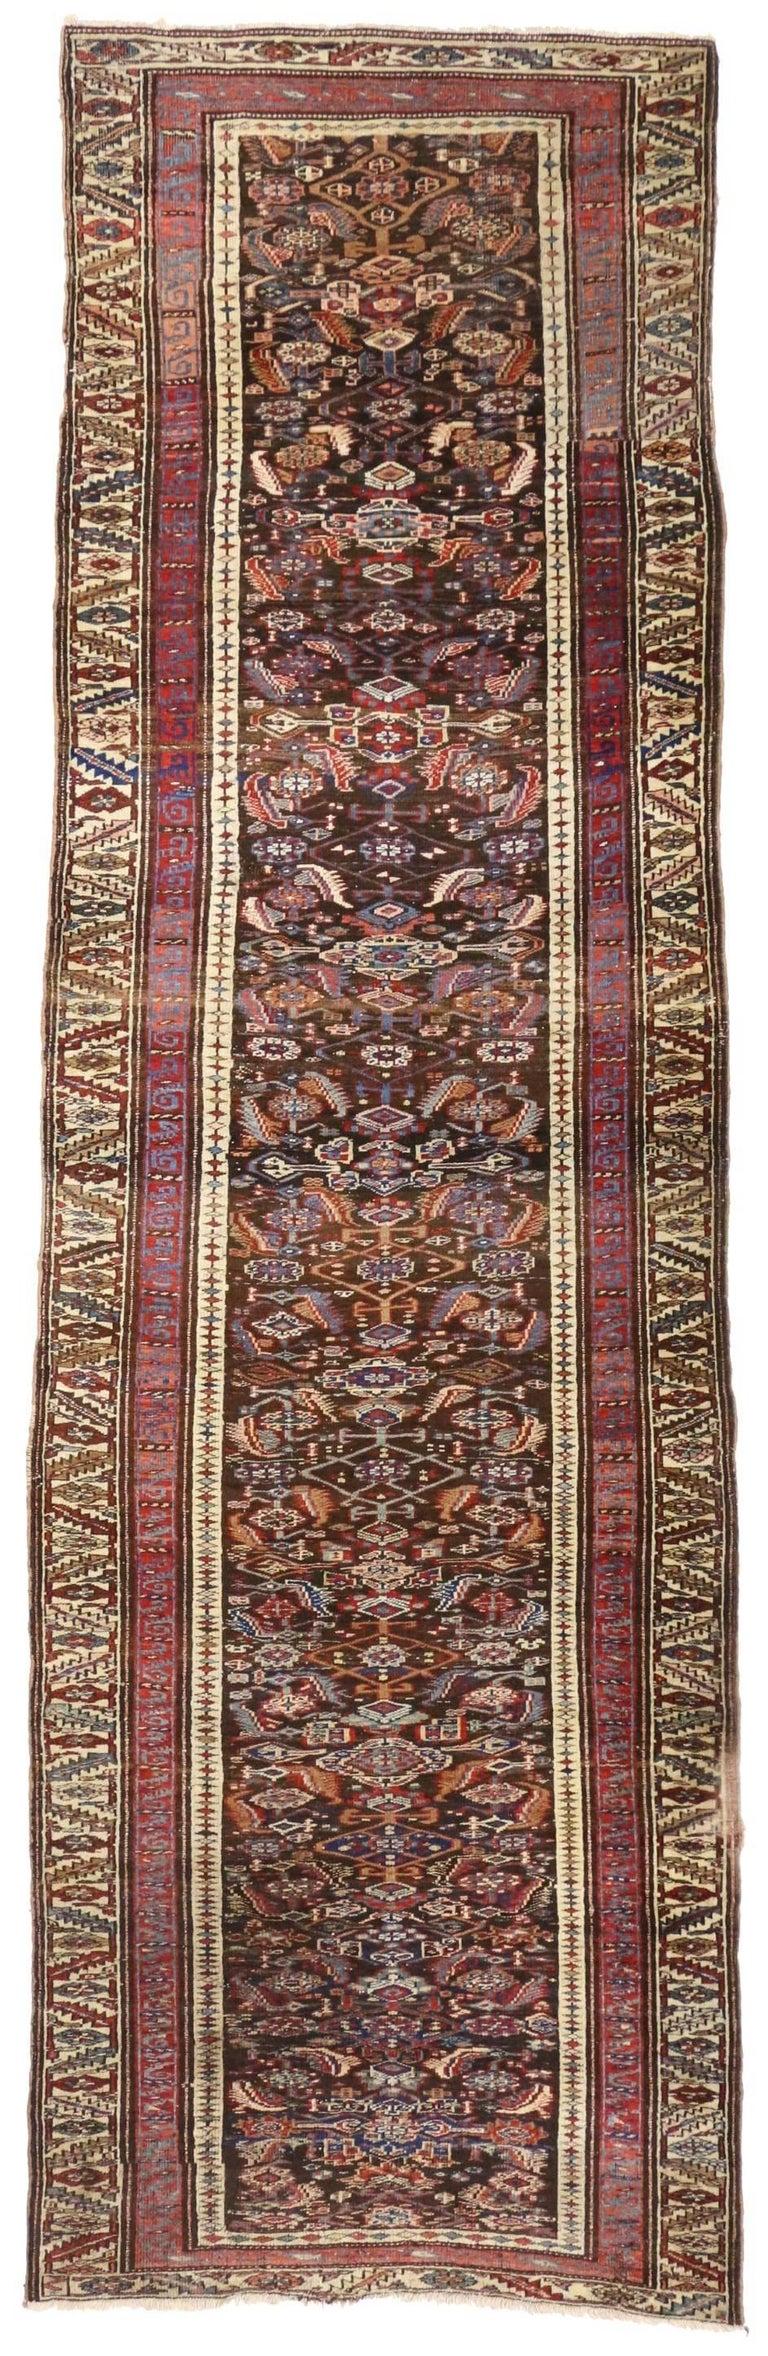 Late 19th Century Antique Persian Bijar Runner, Tribal Style Hallway Runner For Sale 3